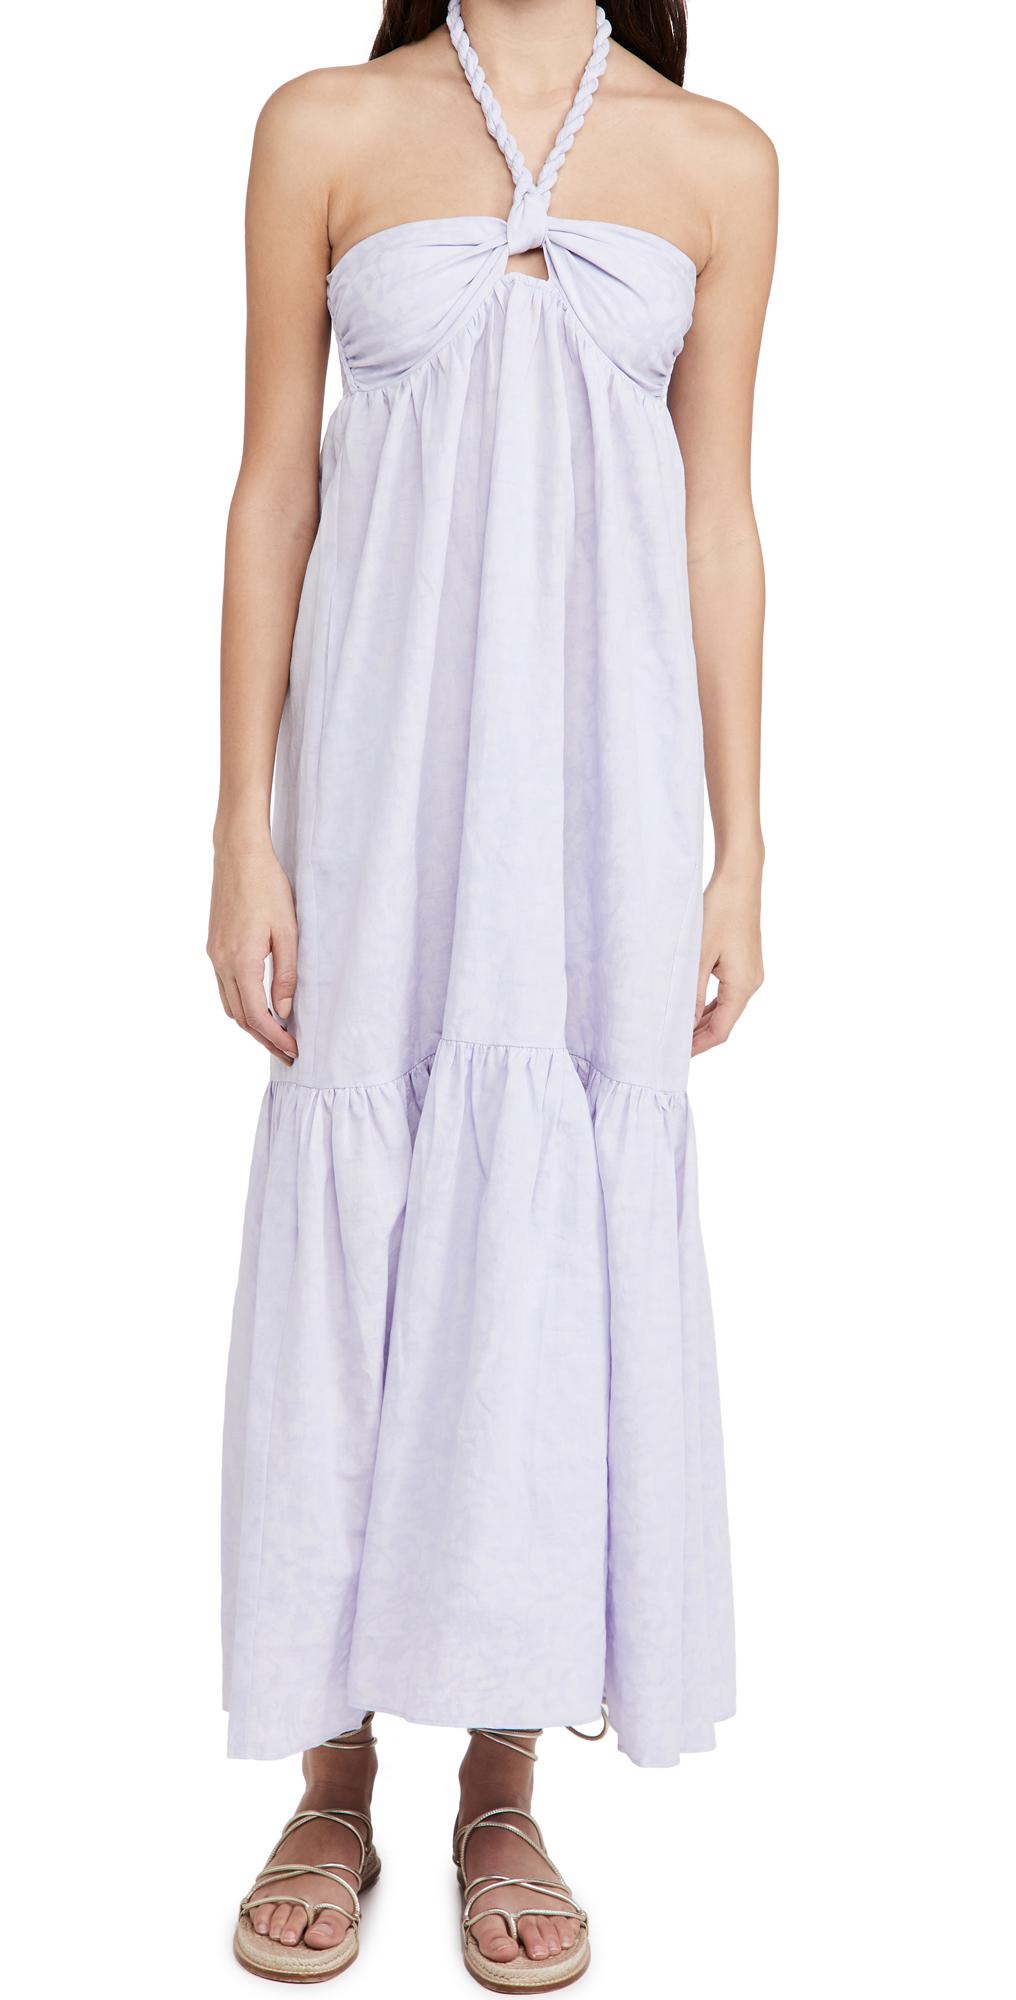 Mara Hoffman Basilia Dress